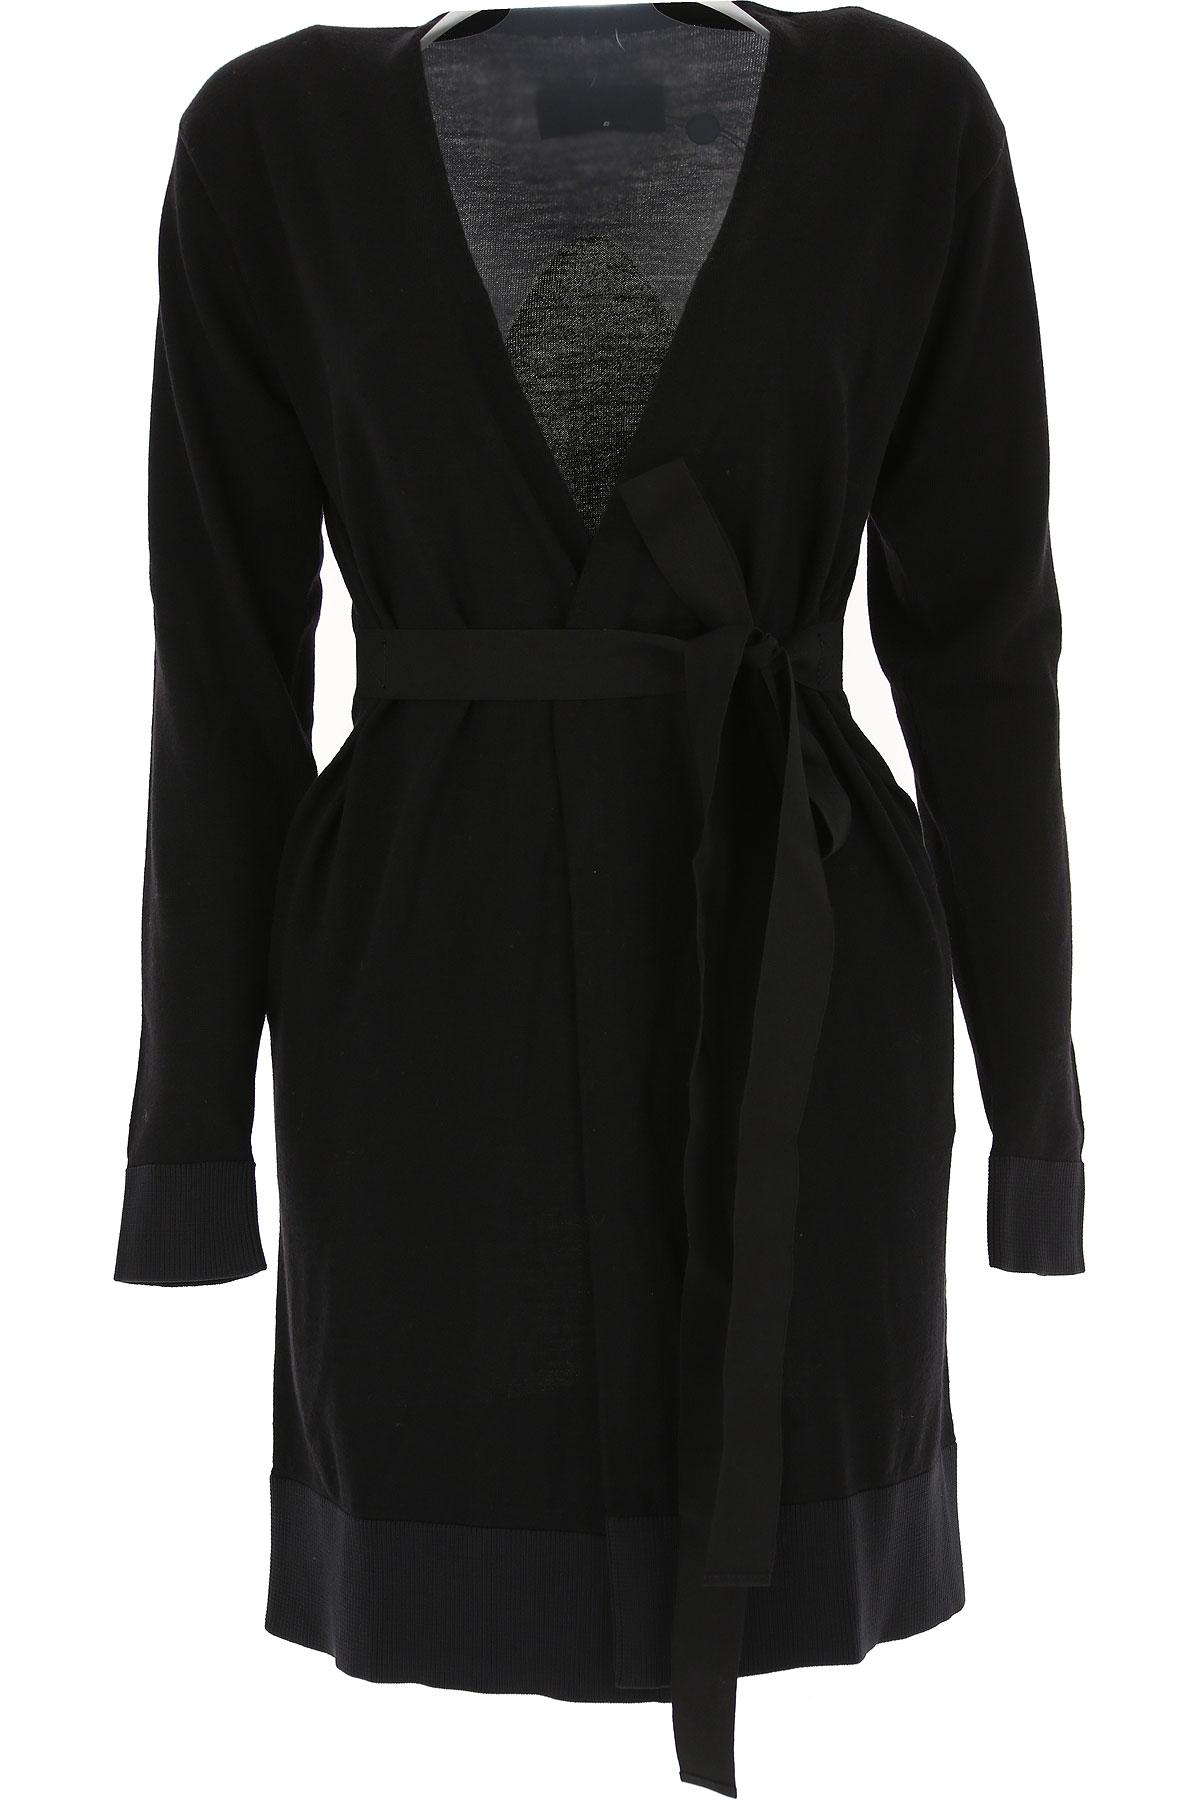 Maison Martin Margiela Sweater for Women Jumper, Black, polyestere, 2017, 10 4 6 8 USA-467896